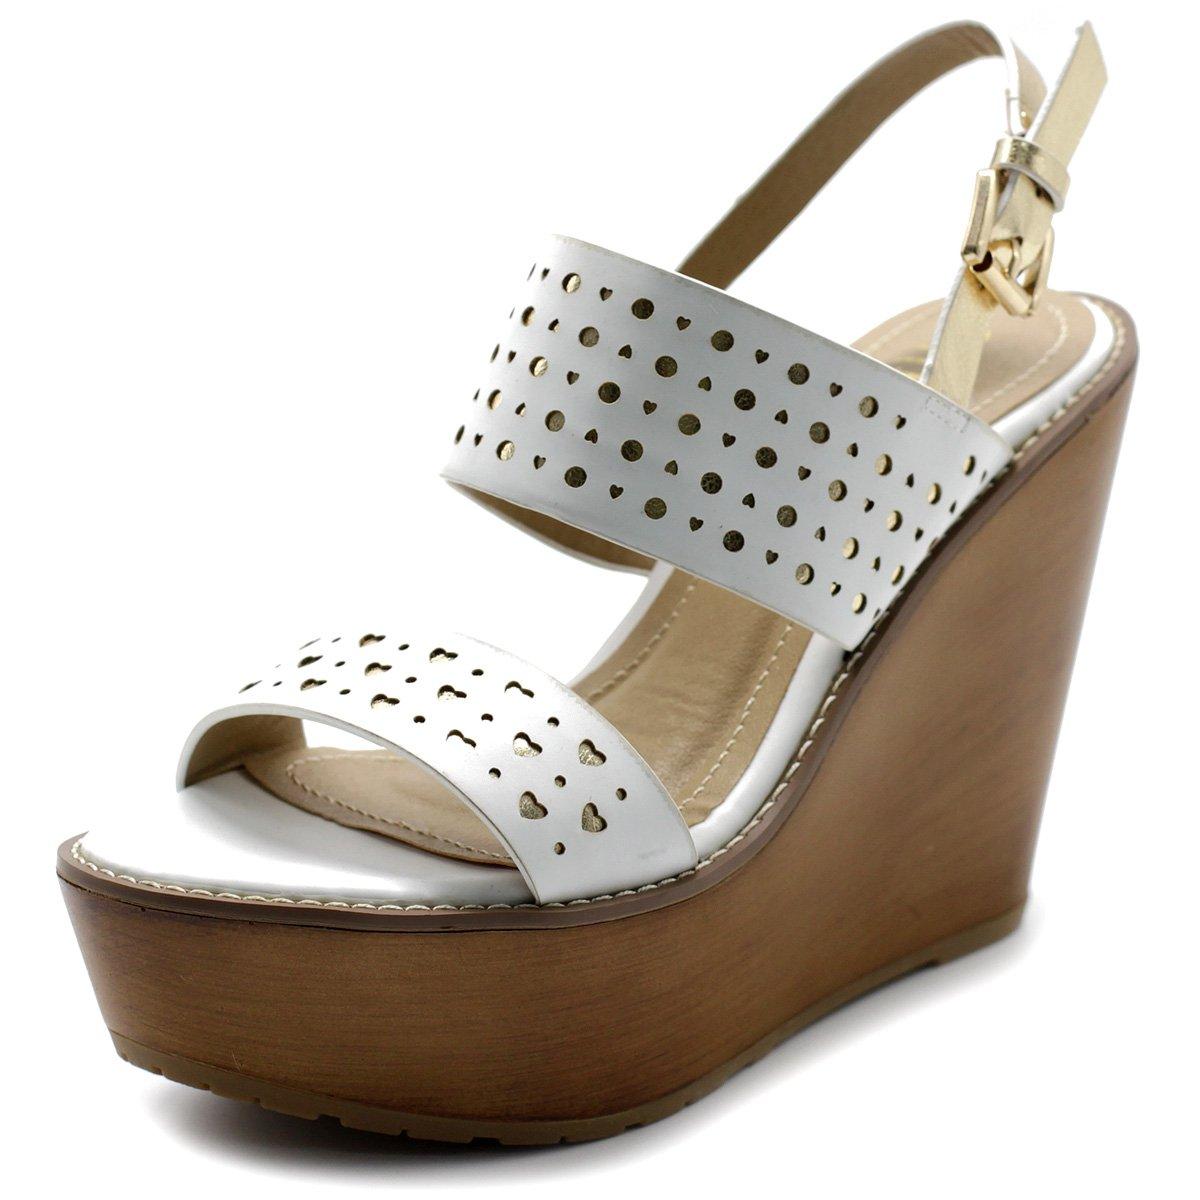 Ollio Womens Shoe Metallic Cutout Burnished Wedge Heel Sandal B01CPQS0V2 10 B(M) US White